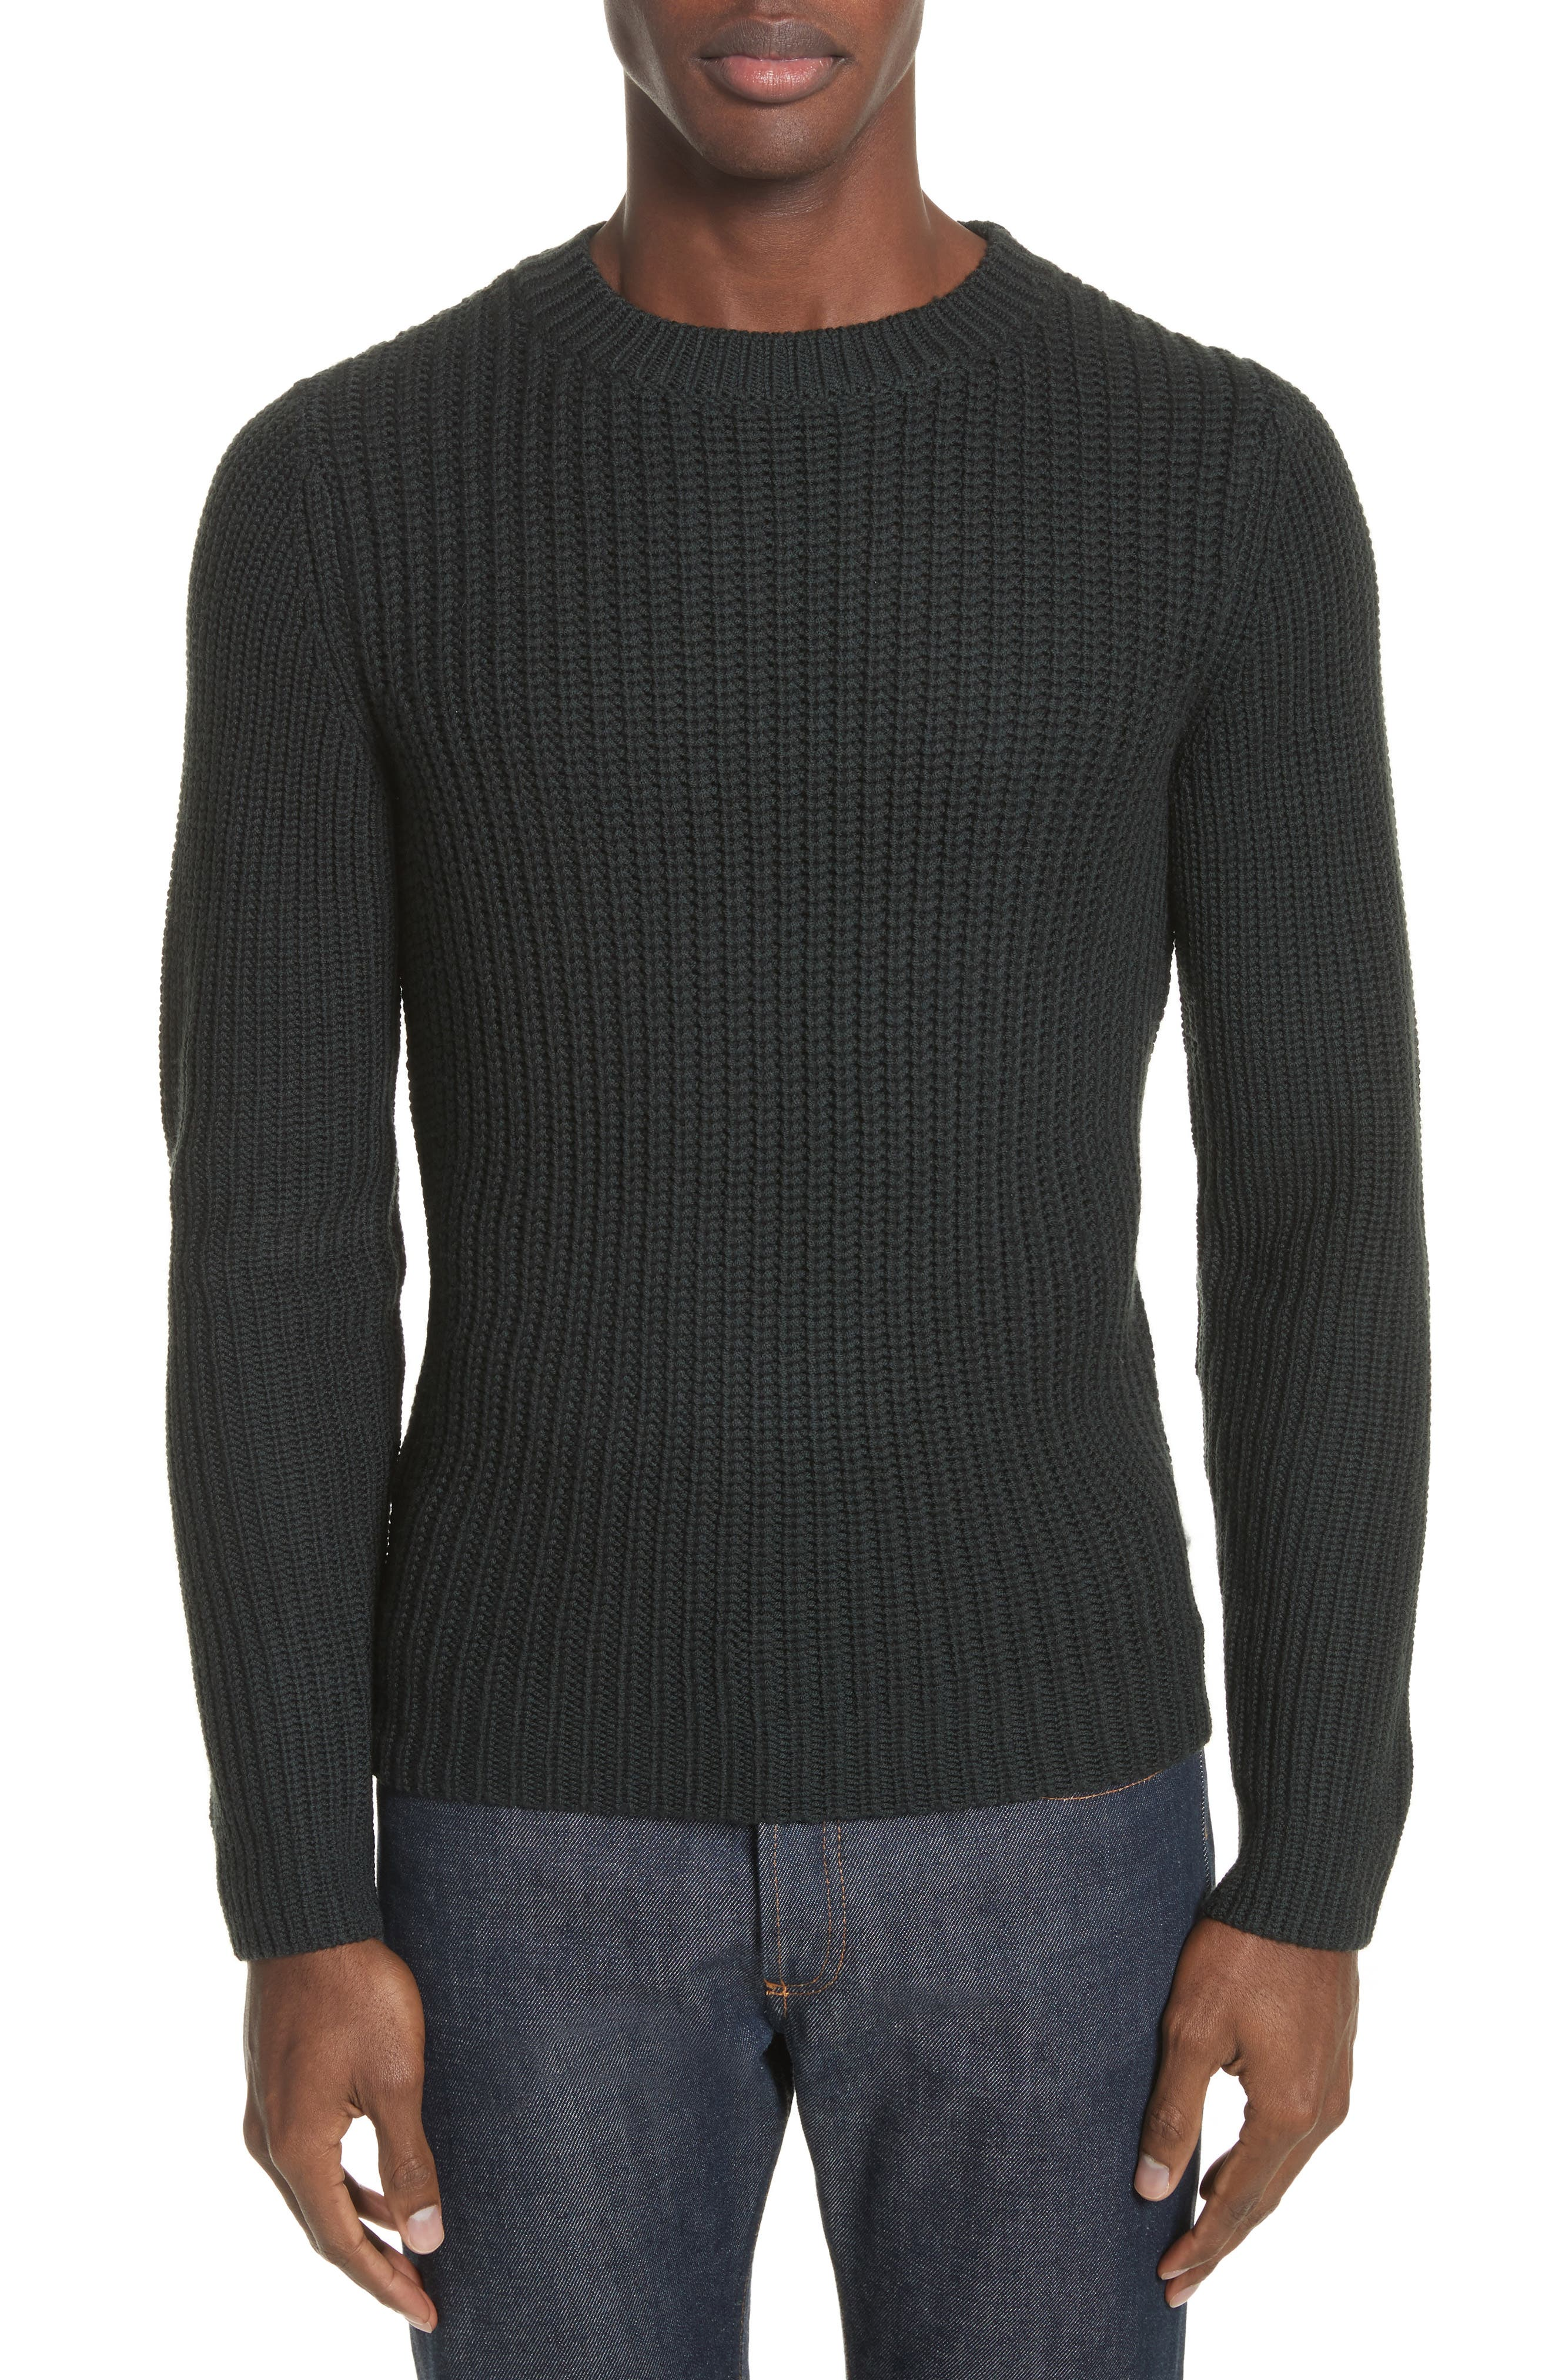 Pull Berger Merino Wool Sweater,                             Main thumbnail 1, color,                             300